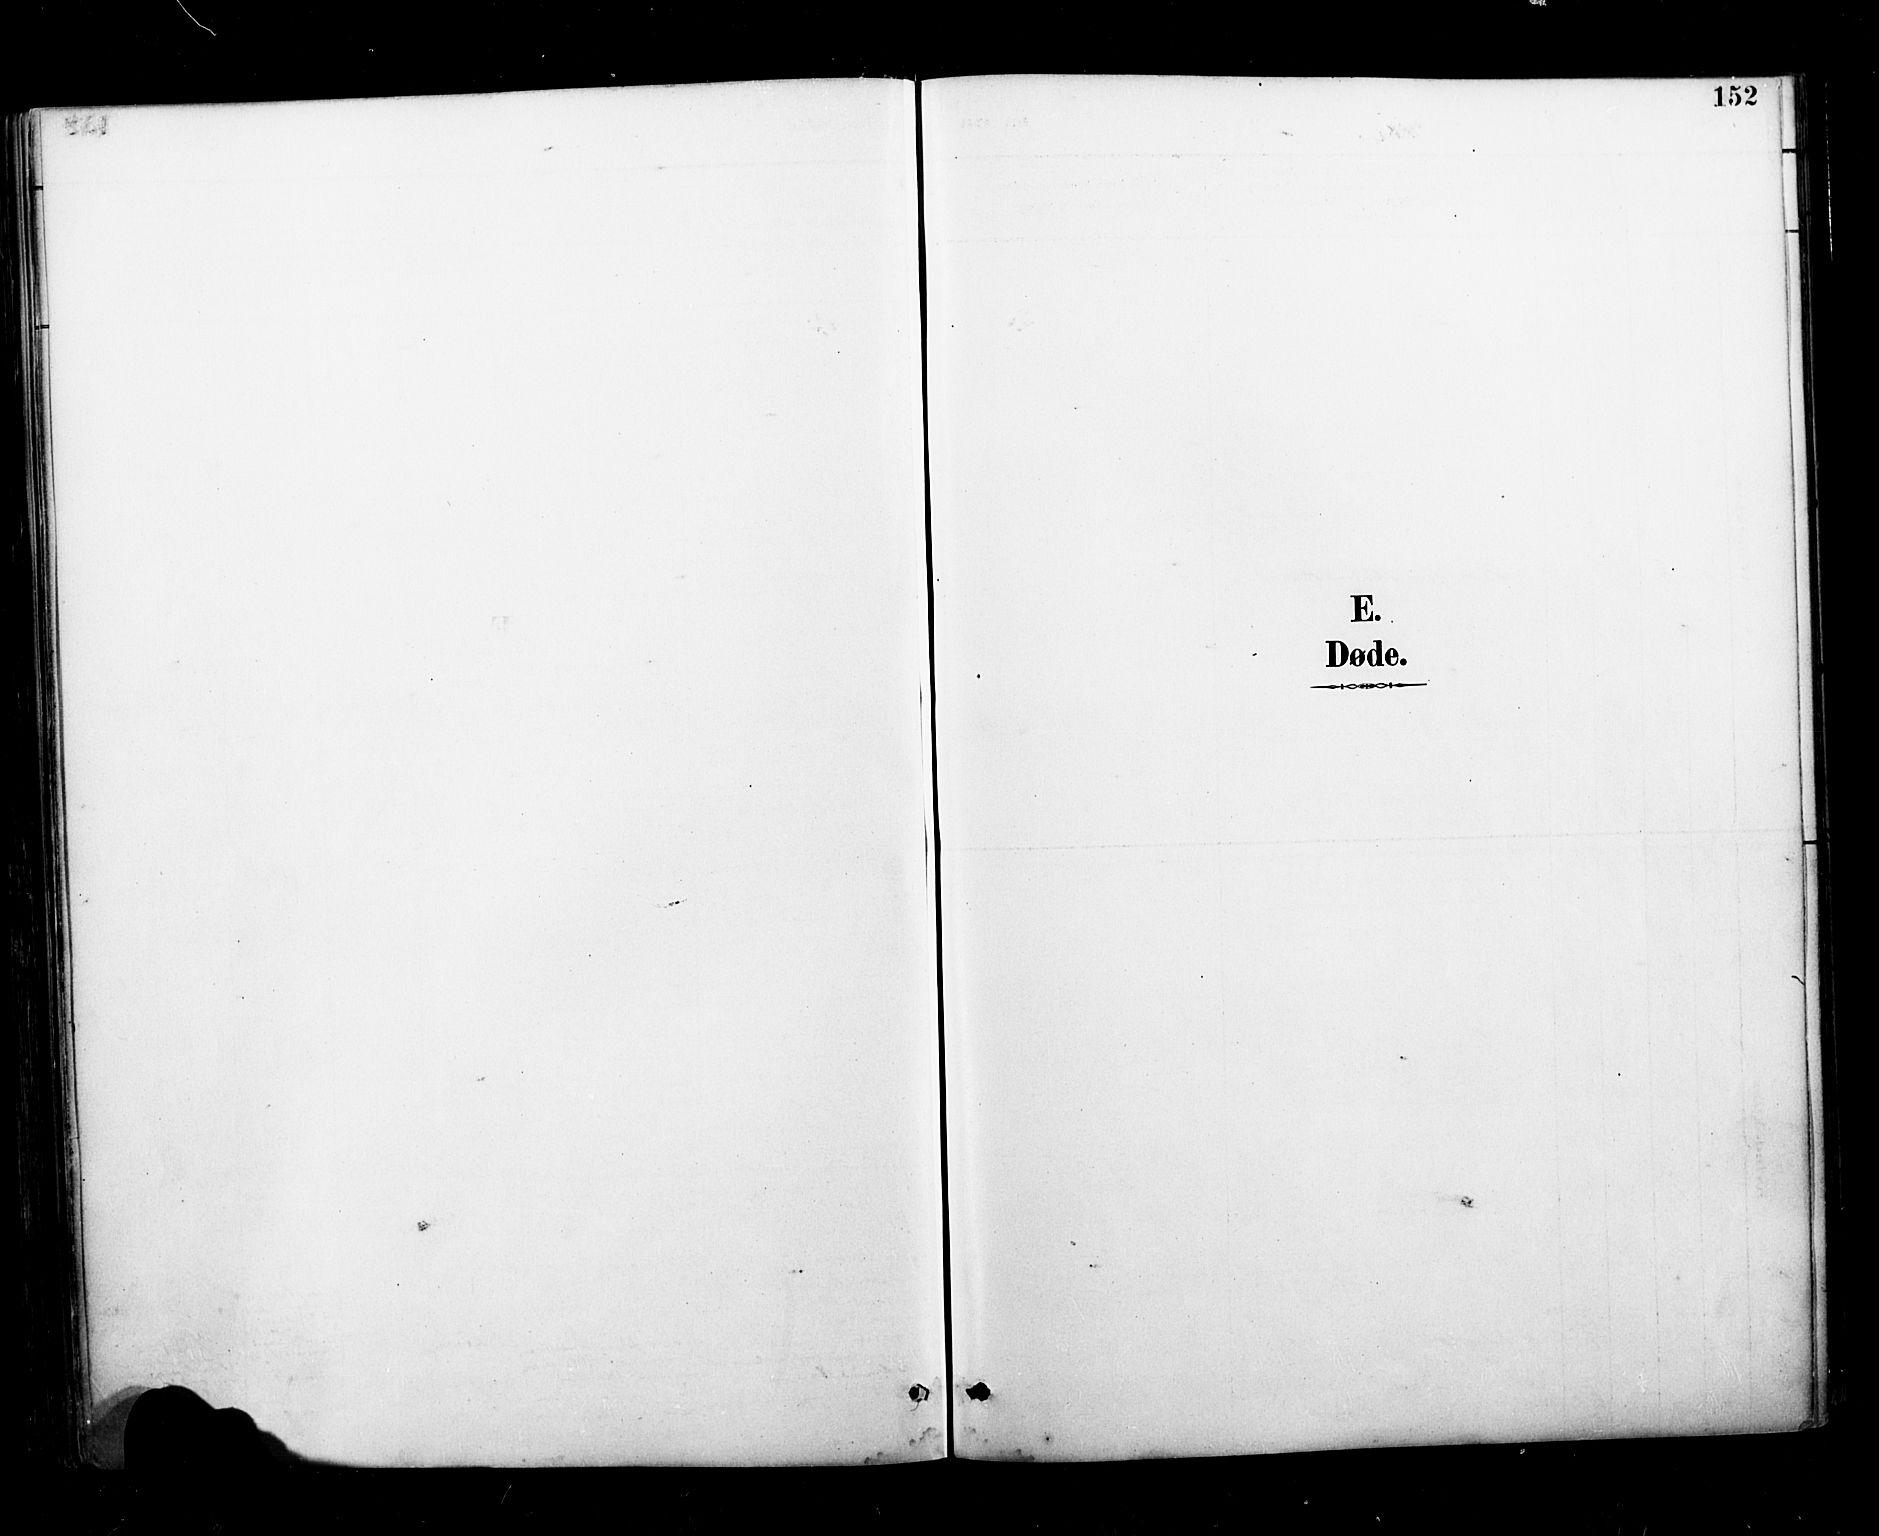 SAT, Ministerialprotokoller, klokkerbøker og fødselsregistre - Nordland, 827/L0401: Ministerialbok nr. 827A13, 1887-1905, s. 152